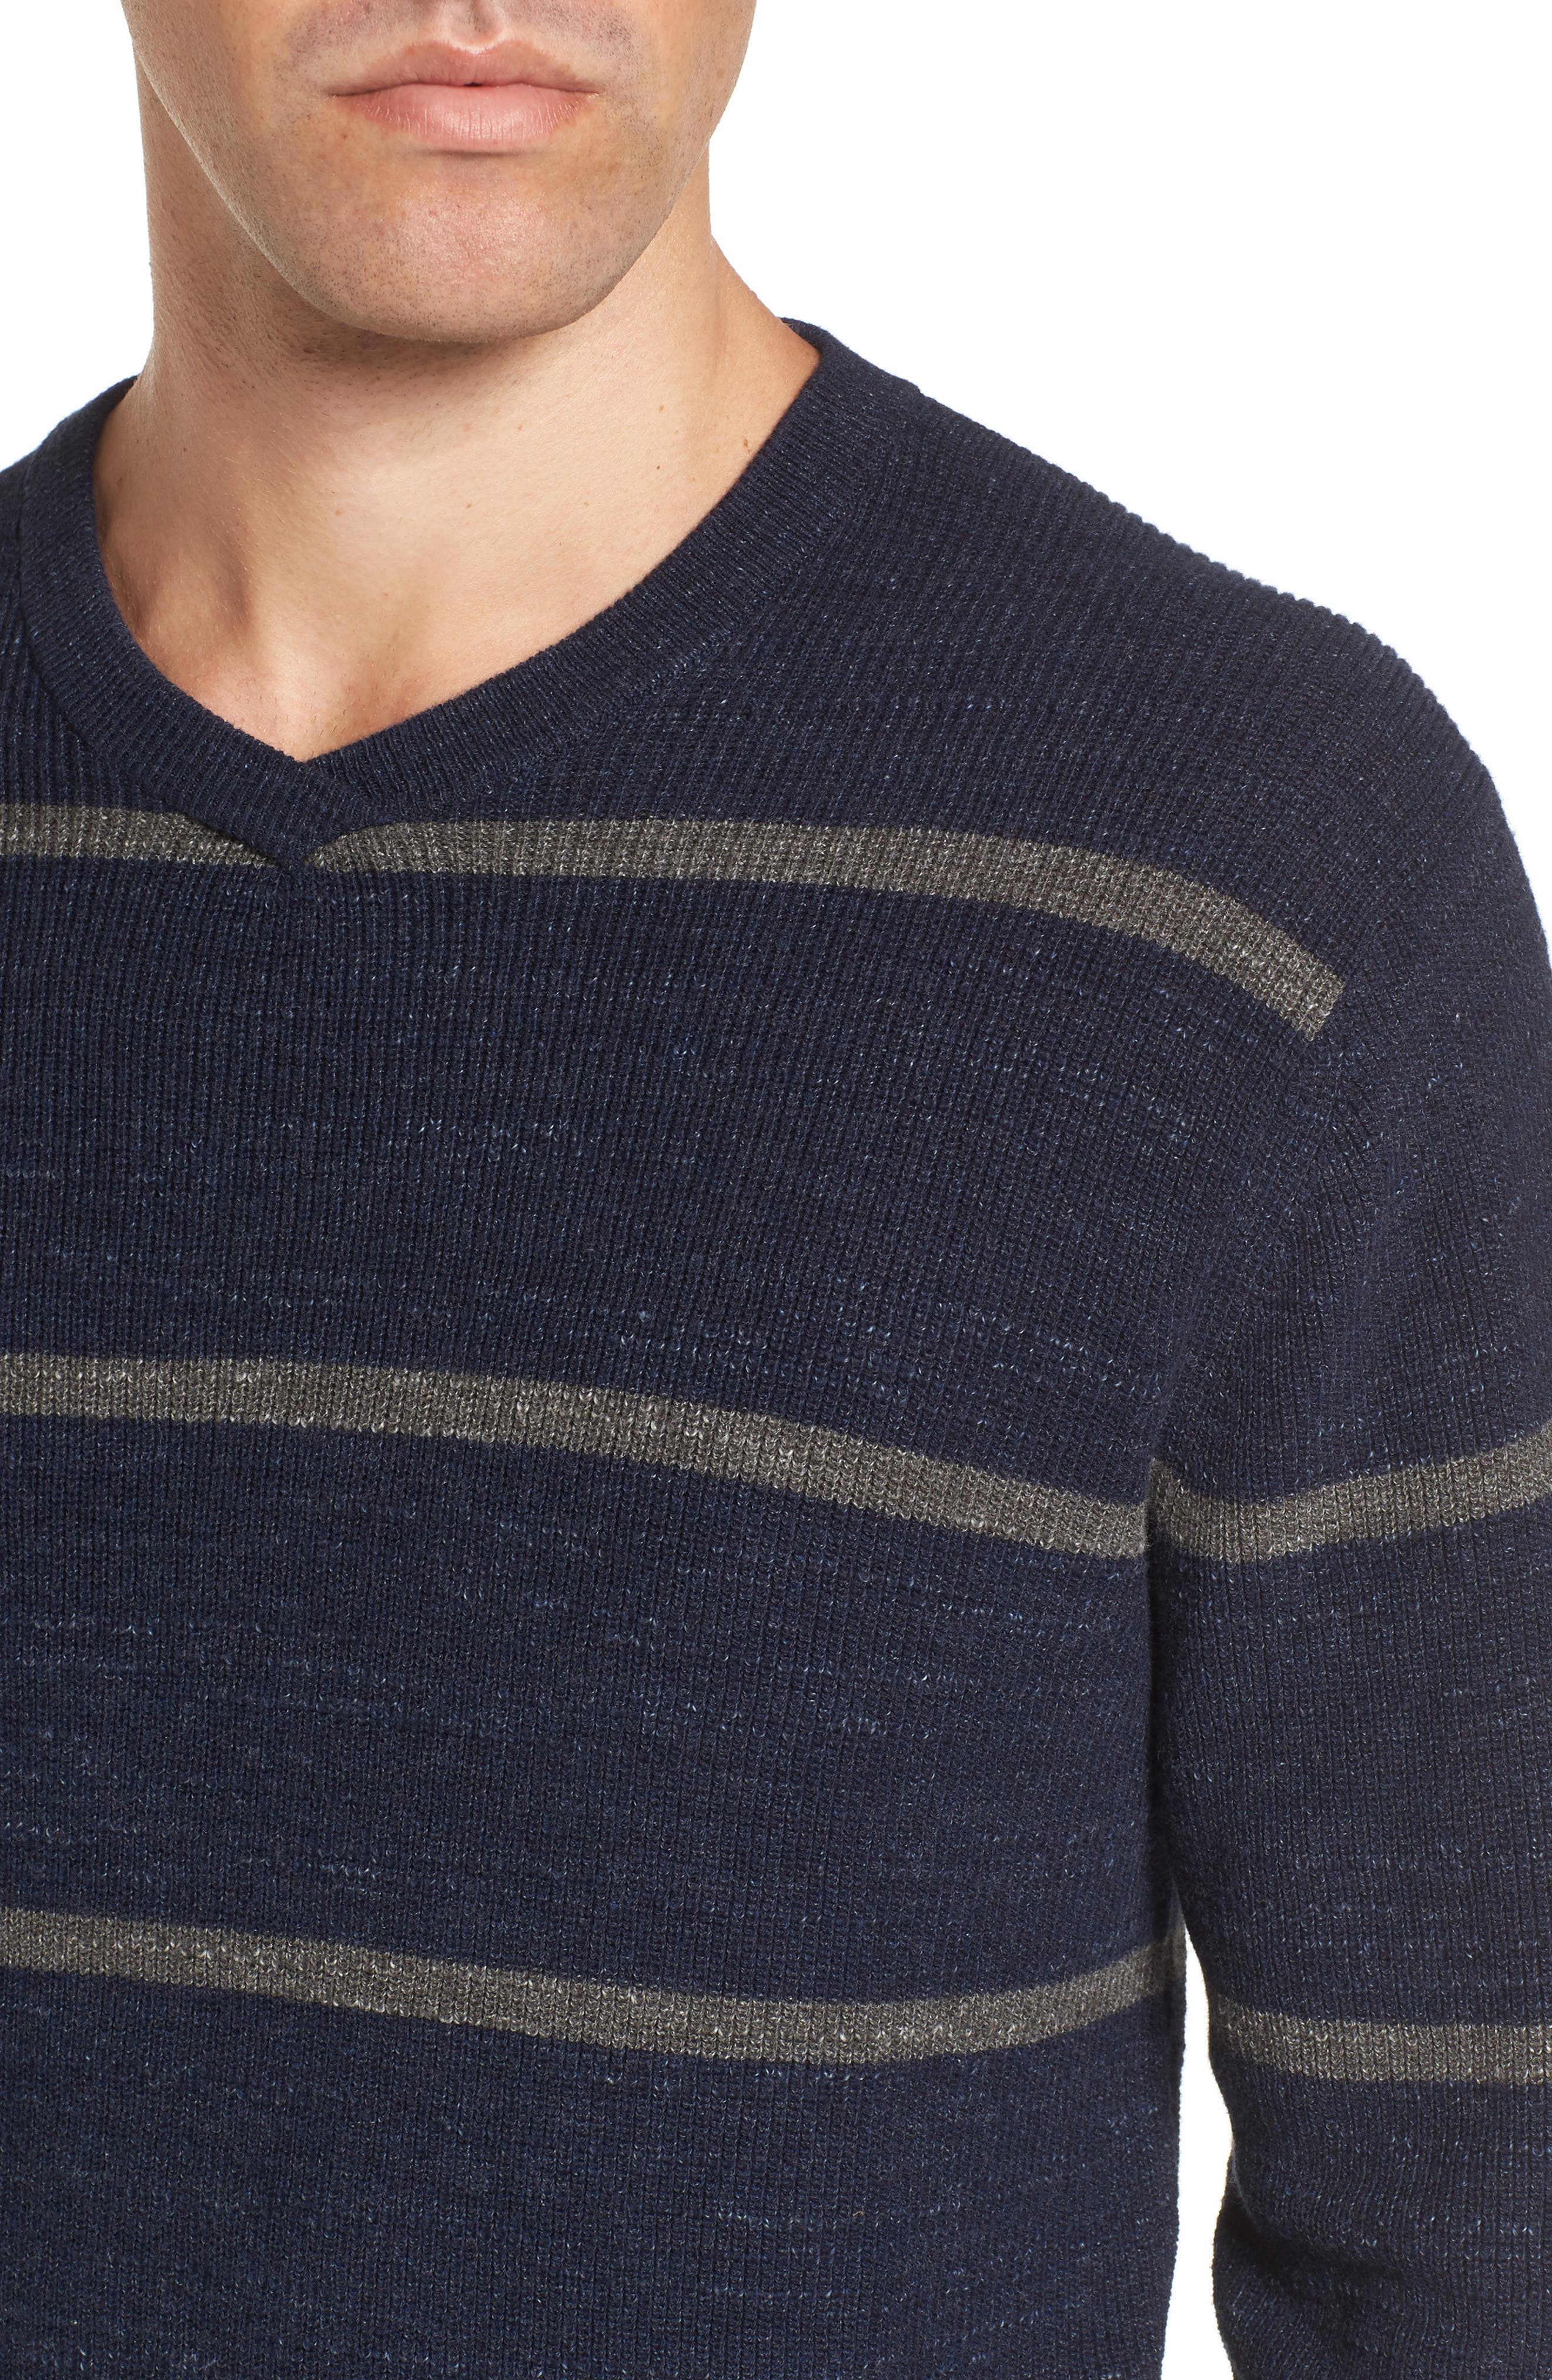 Ardsley Stripe V-Neck Sweater,                             Alternate thumbnail 4, color,                             Navy/Light Charcoal